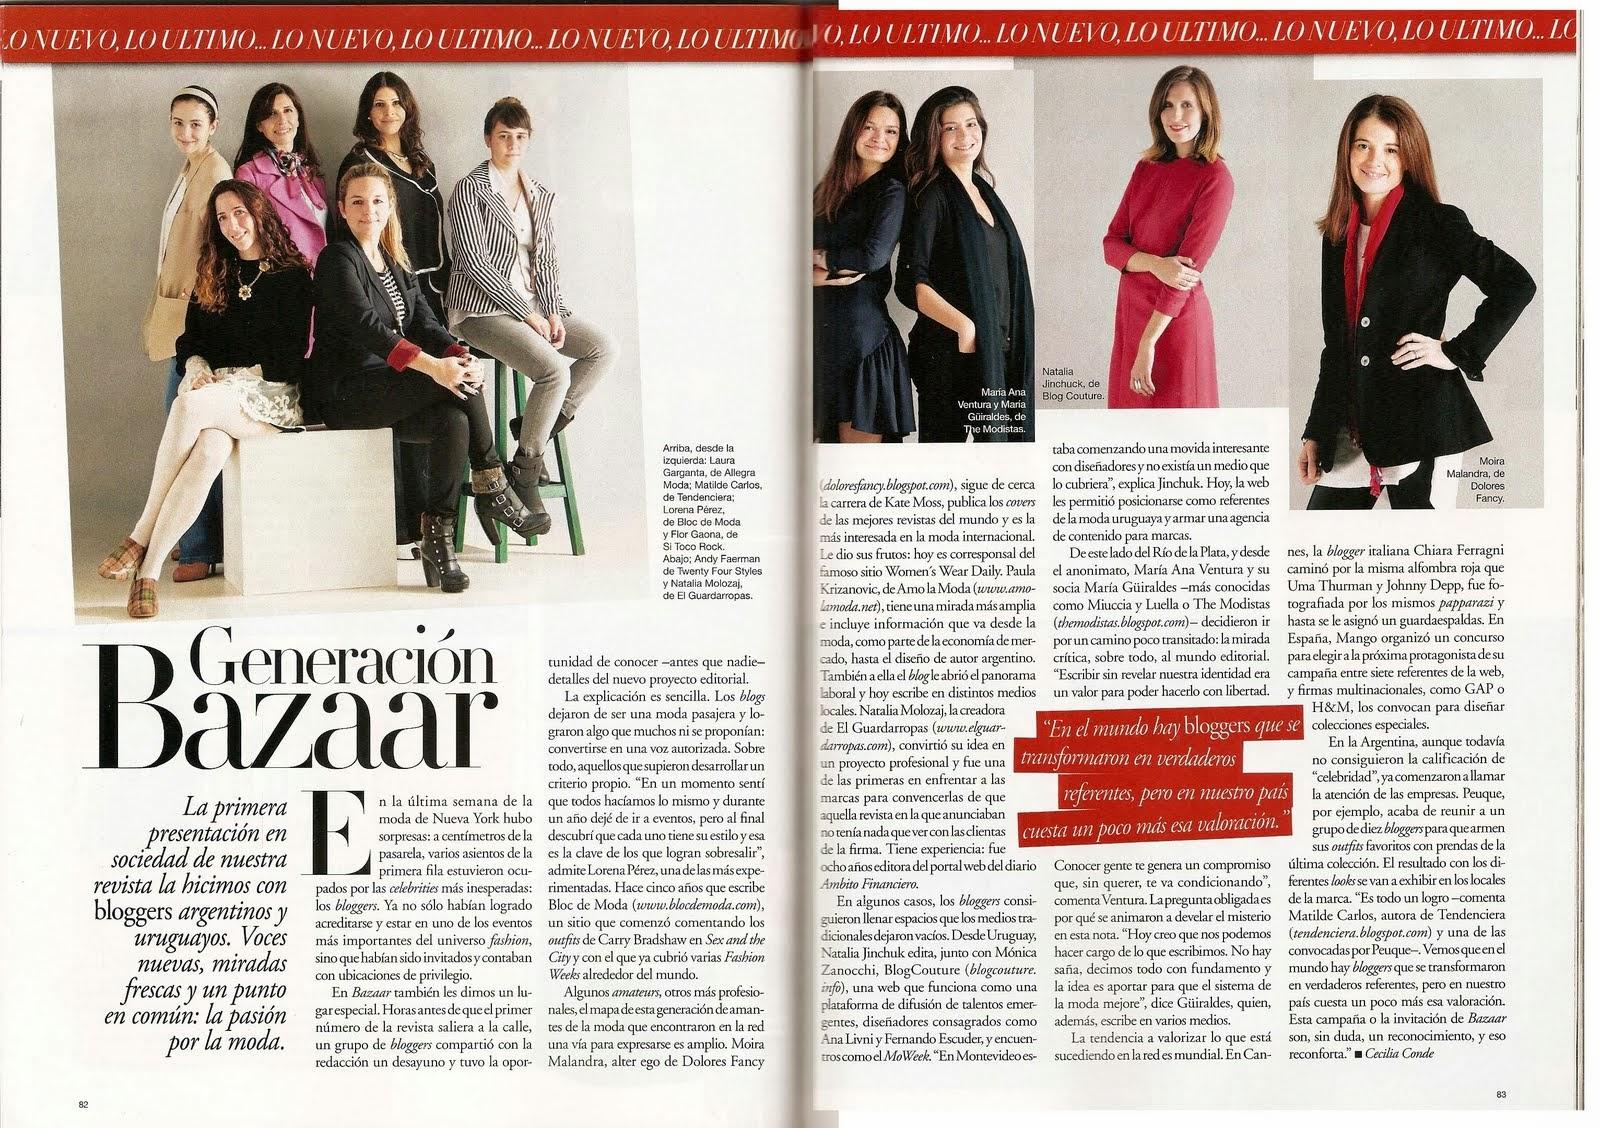 Nota: Bazaar Argentina